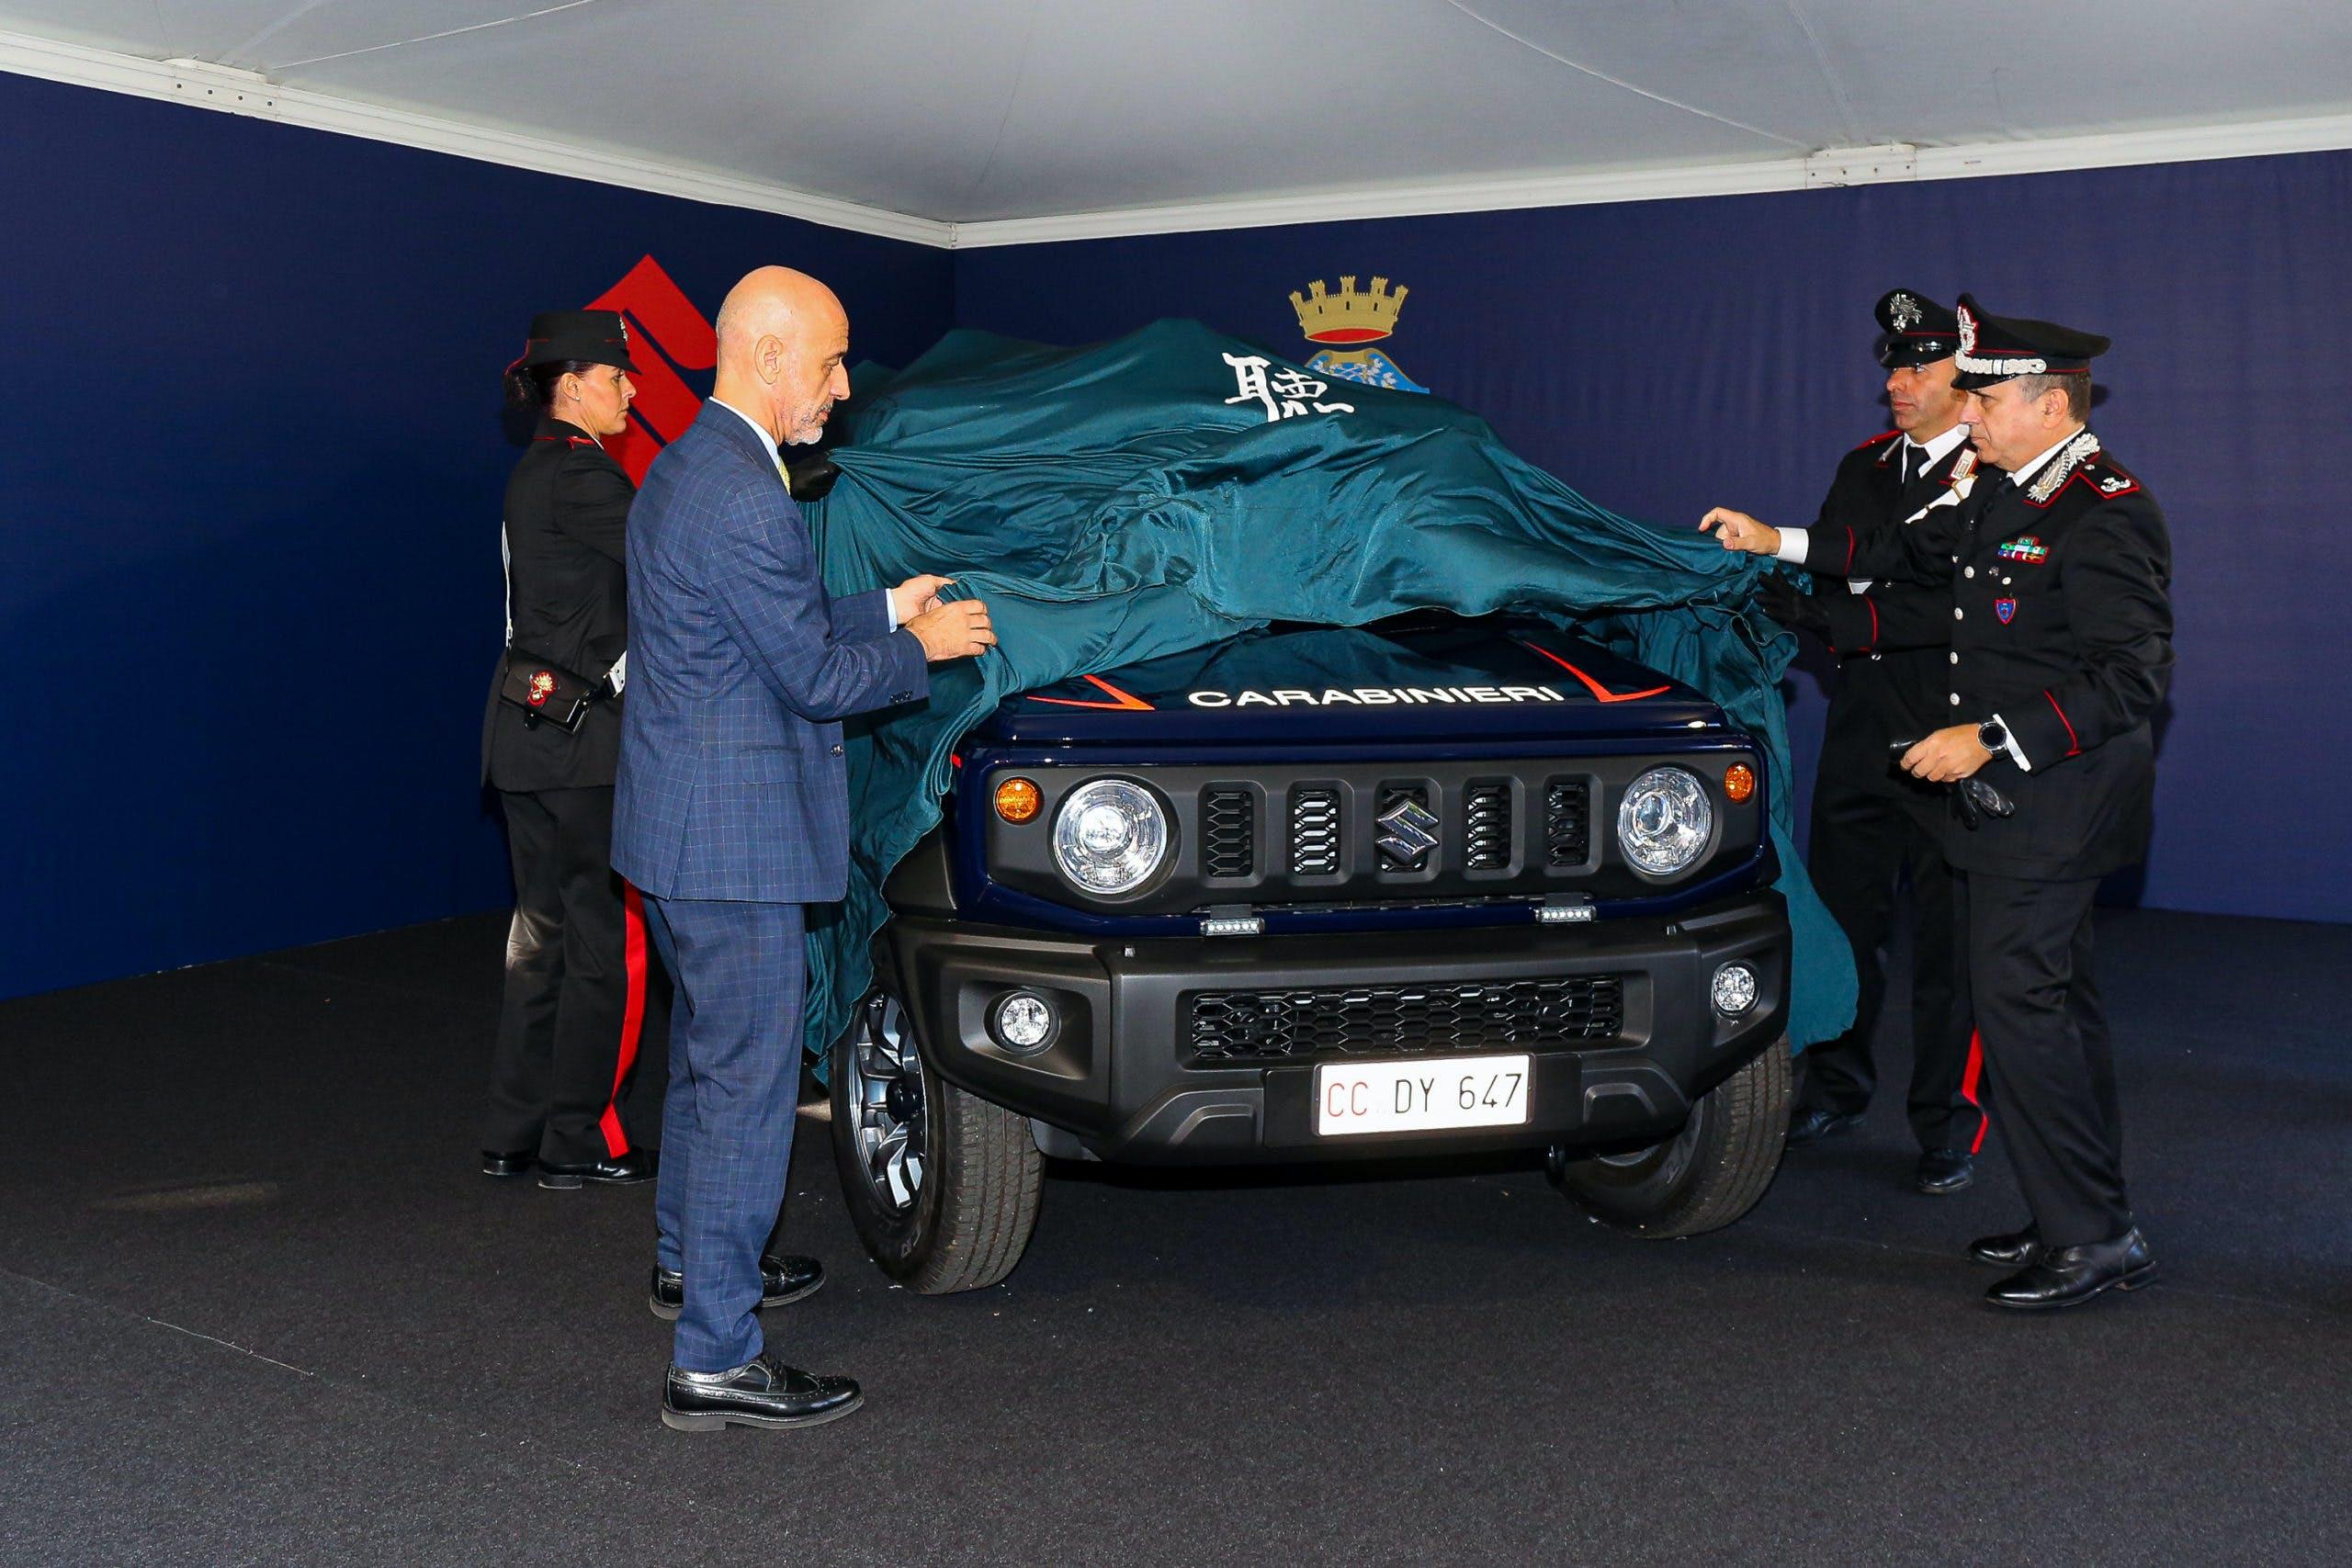 Suzuki Jimny Carabinieri reveal